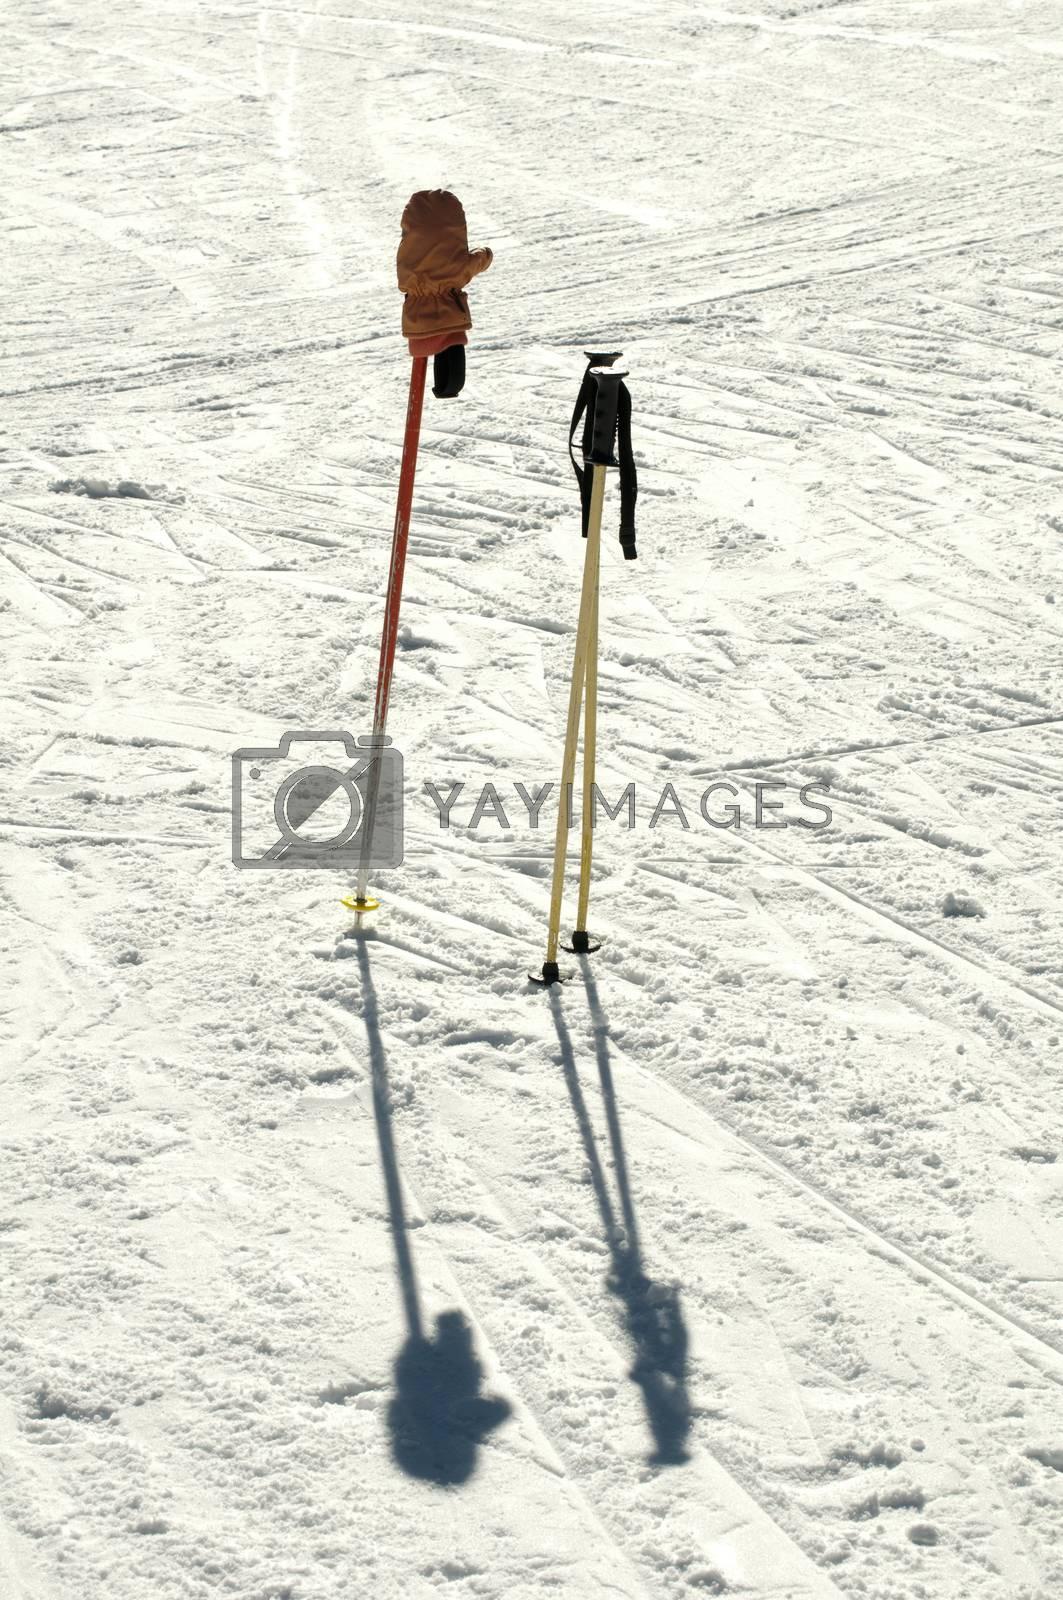 Ski poles stuck in the snow